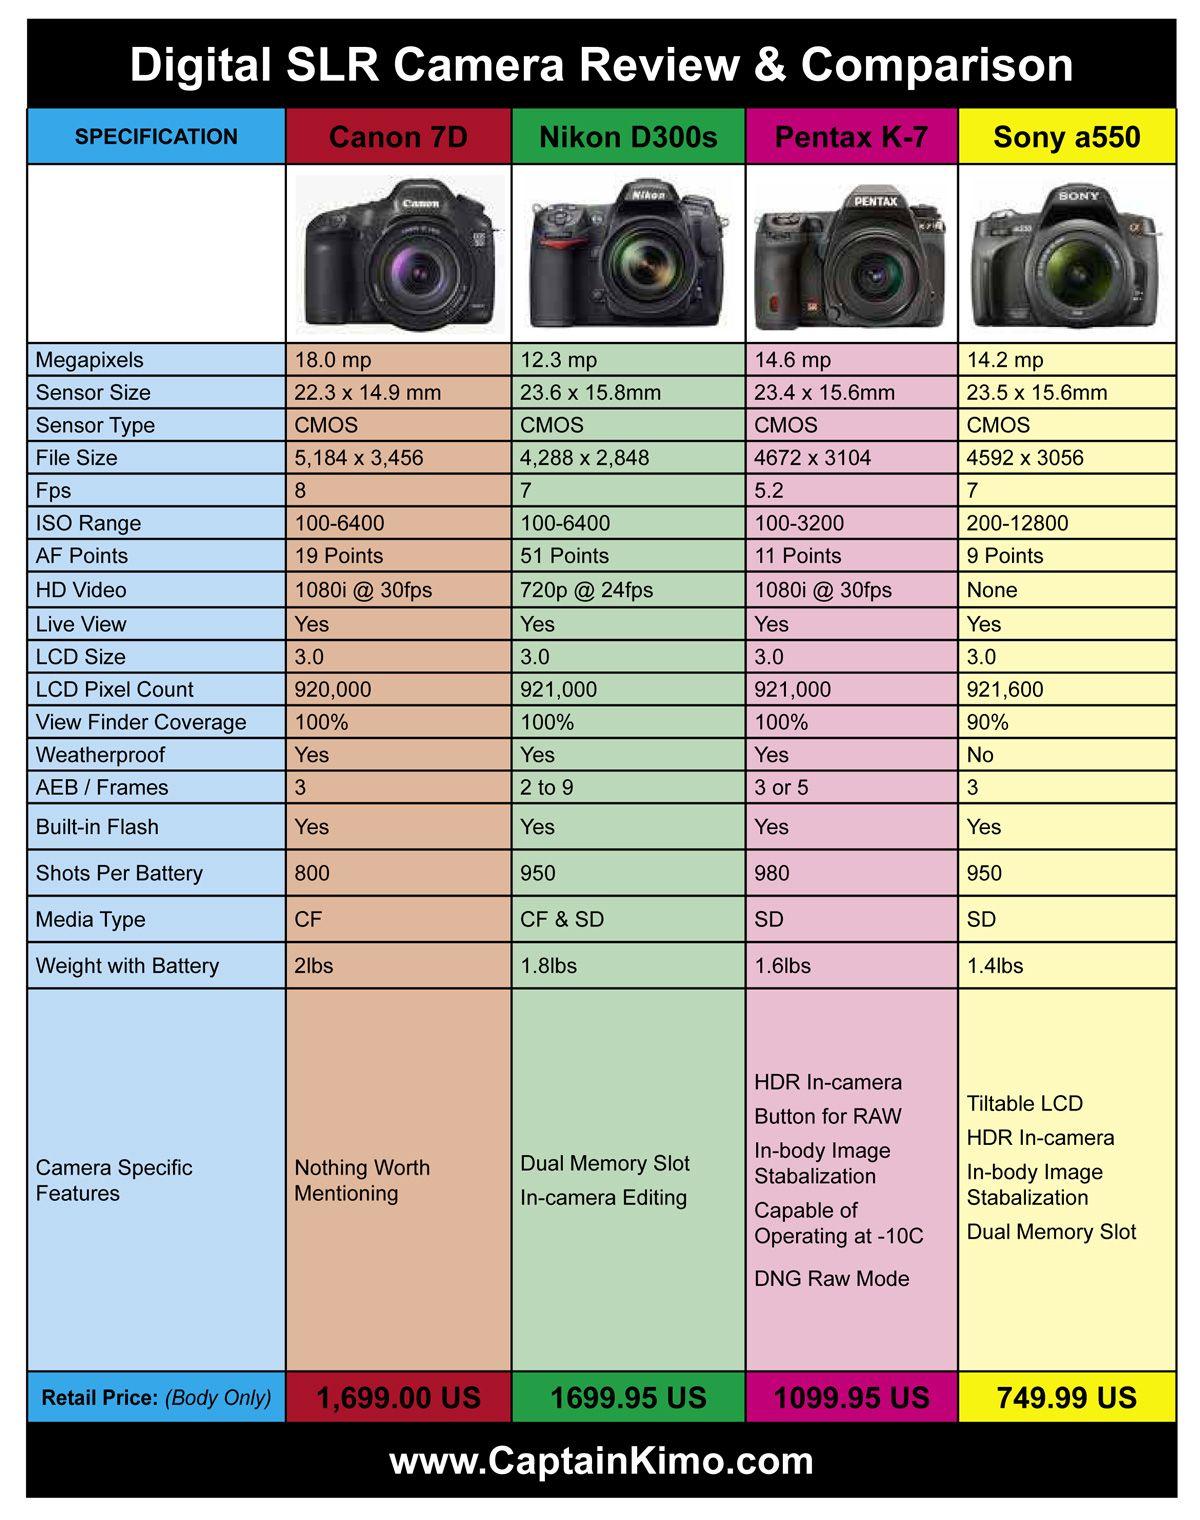 Camera Dslr Cameras Comparison canon dslr comparison chart an overview and of 16 7d nikon d300s pentax k 7 sony